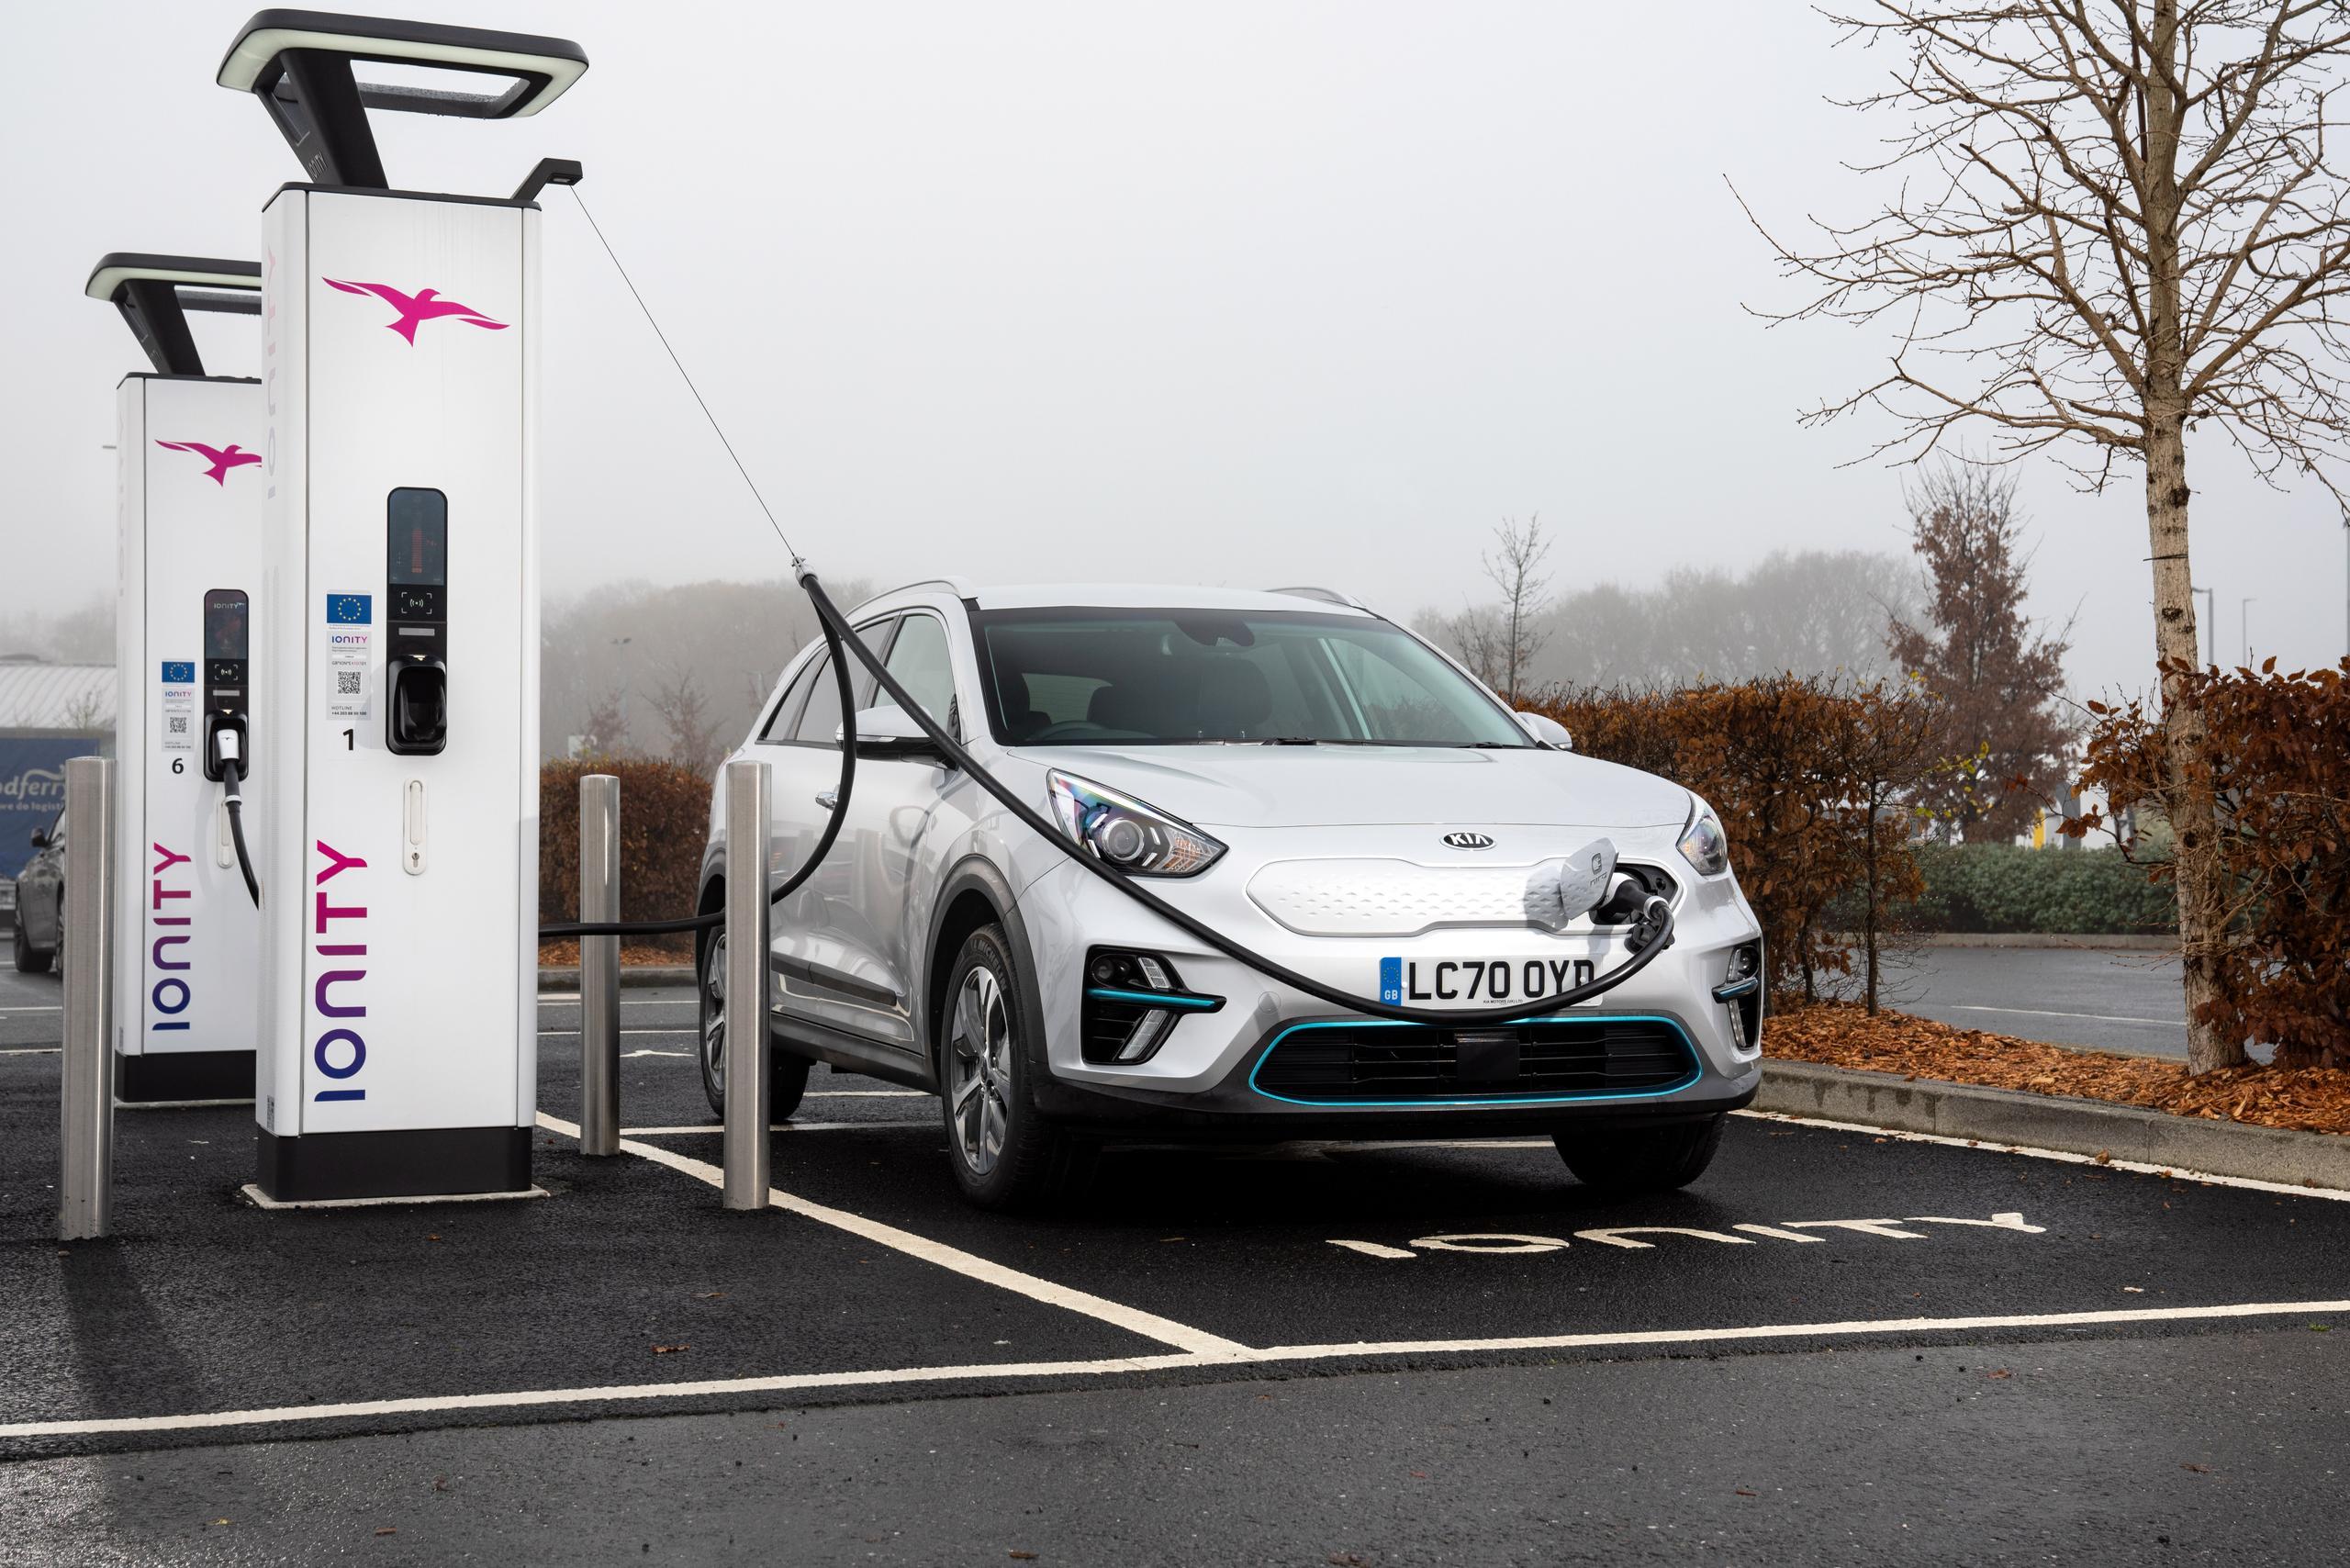 Kia launches KiaCharge - One account, 13,900 charging points